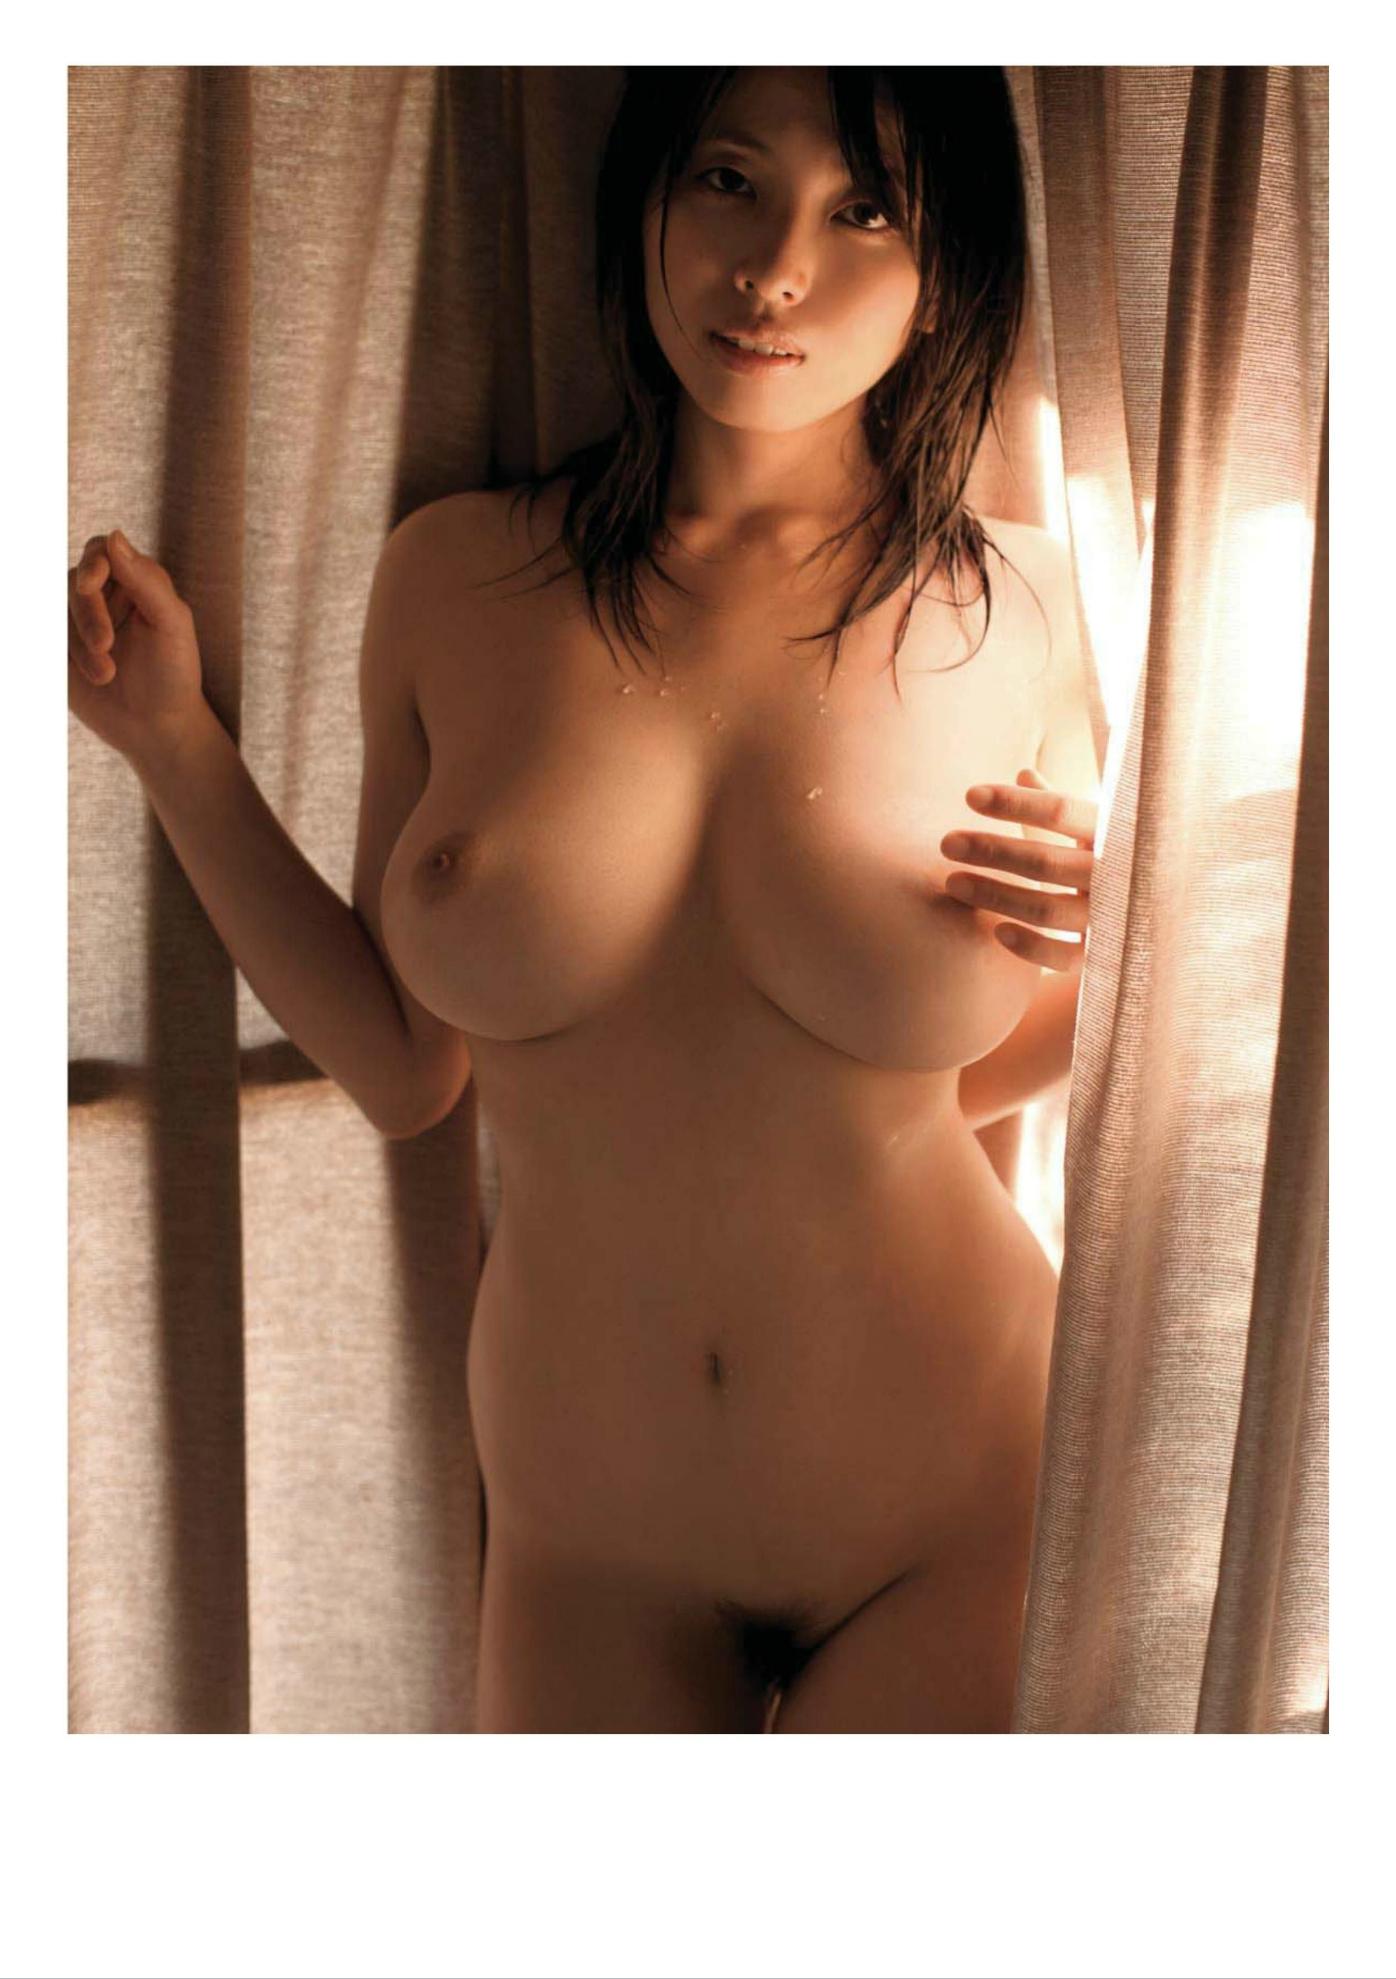 image http://scanlover.com/assets/images/2952-Nmpv4G0lbIzi6BKl.jpeg